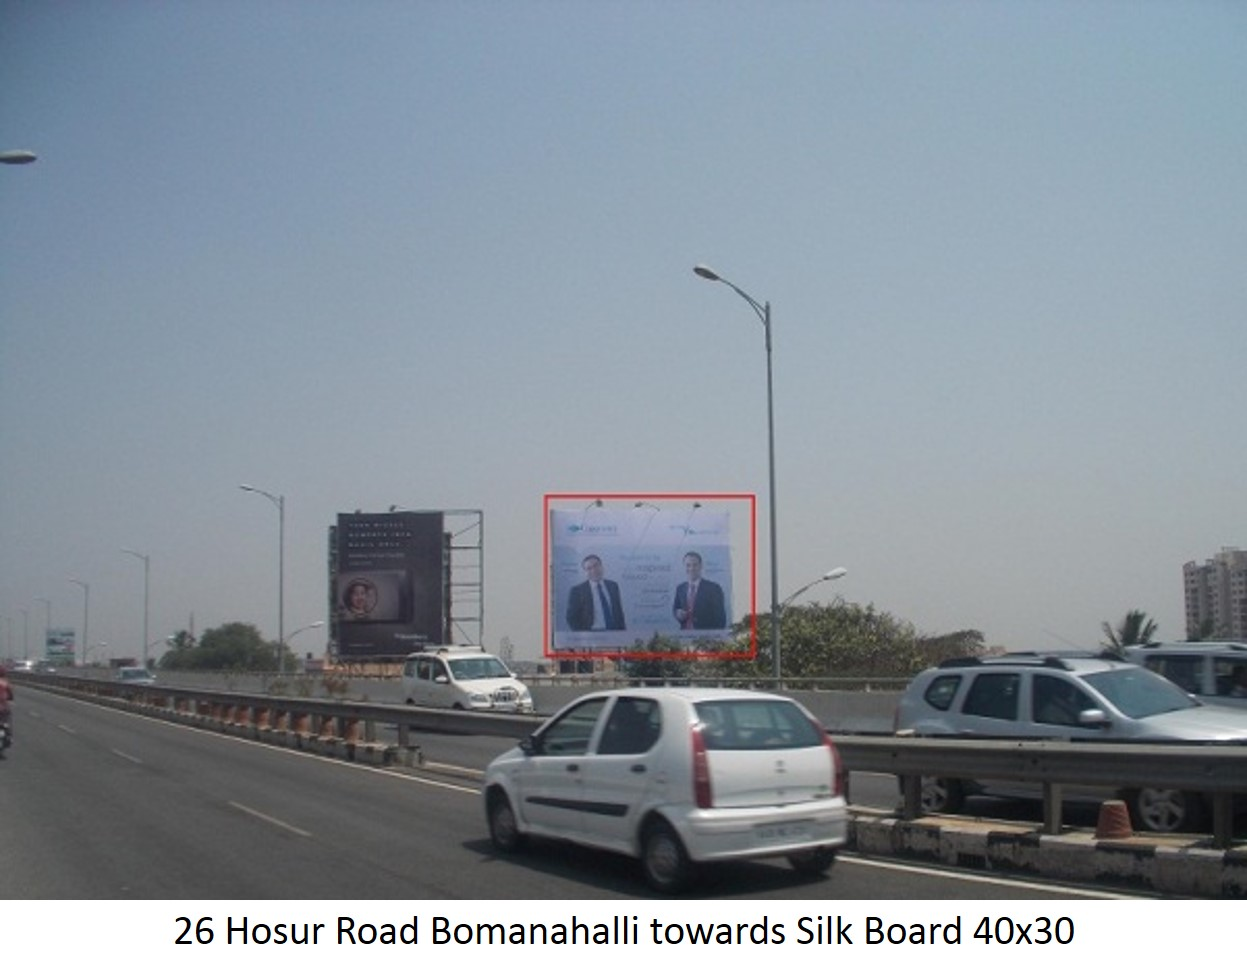 Hosur Road Bomanahalli Towards Silk Board, Bengaluru